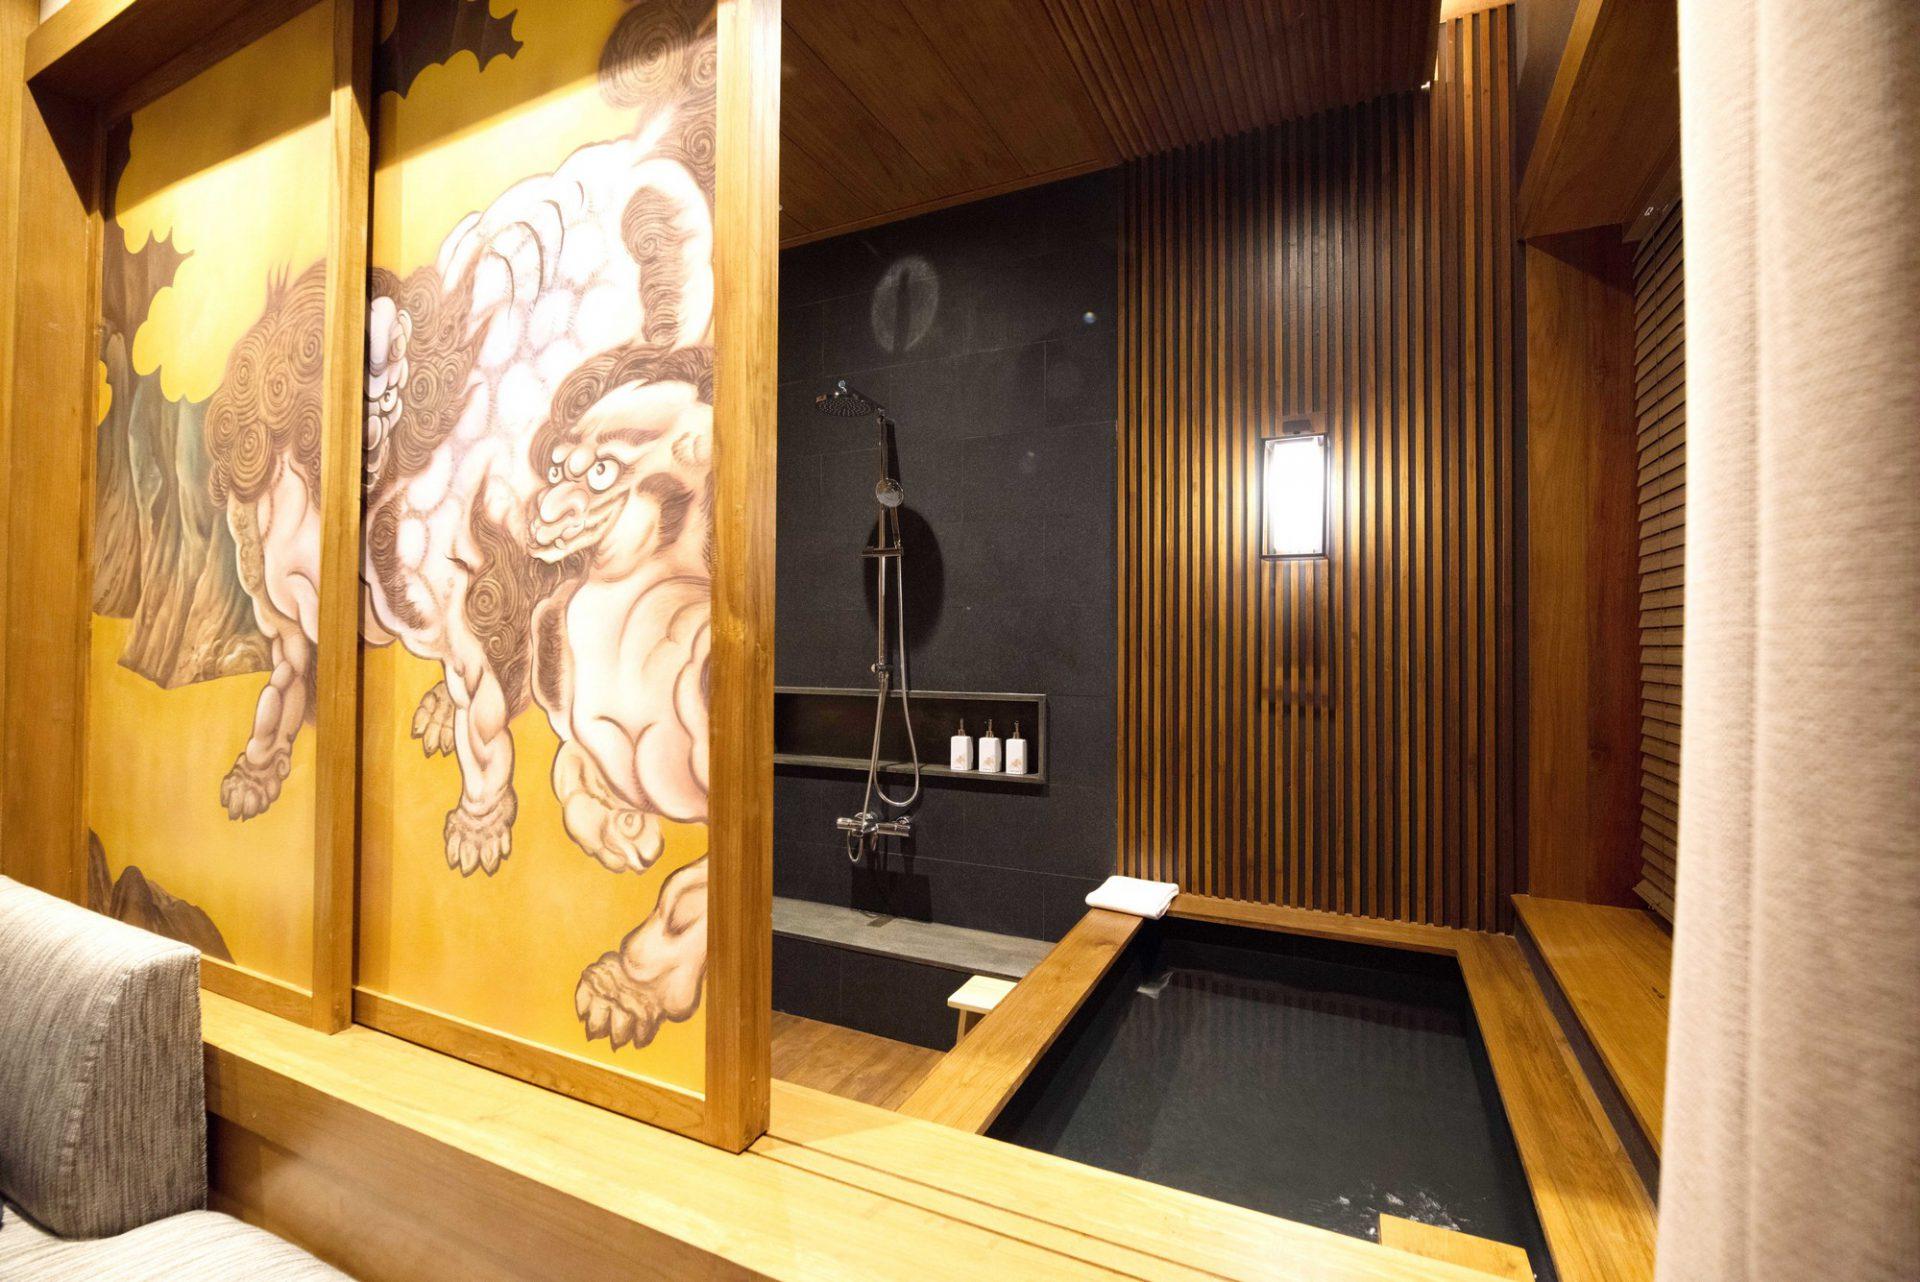 3-Bedroom Imperial Onsen Suite